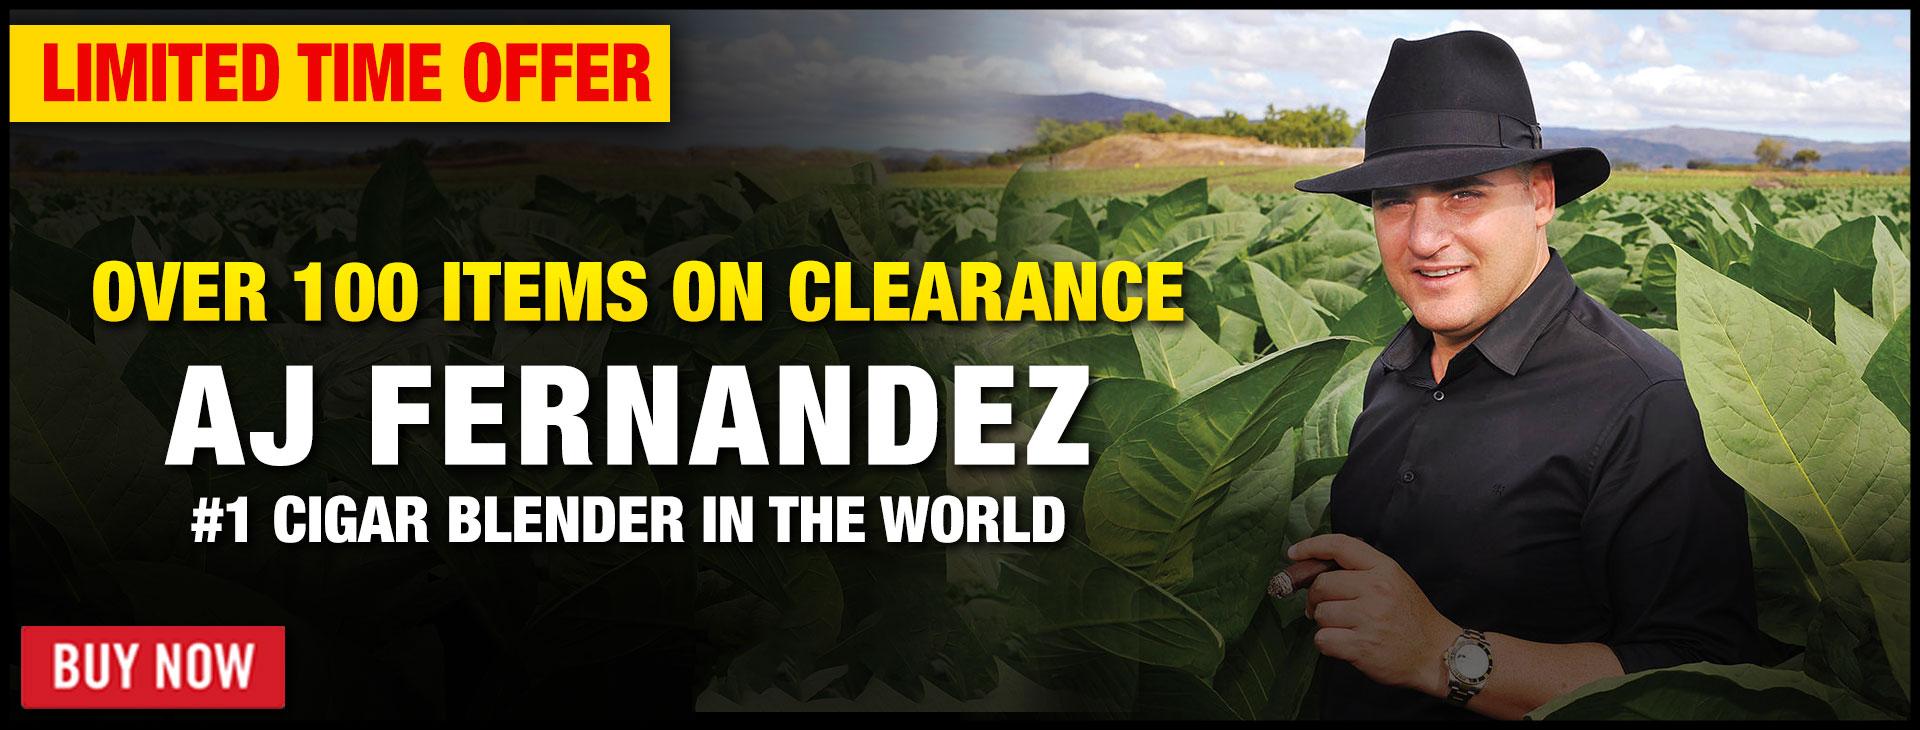 aj-fernandez-clearance-2021-banner.jpg